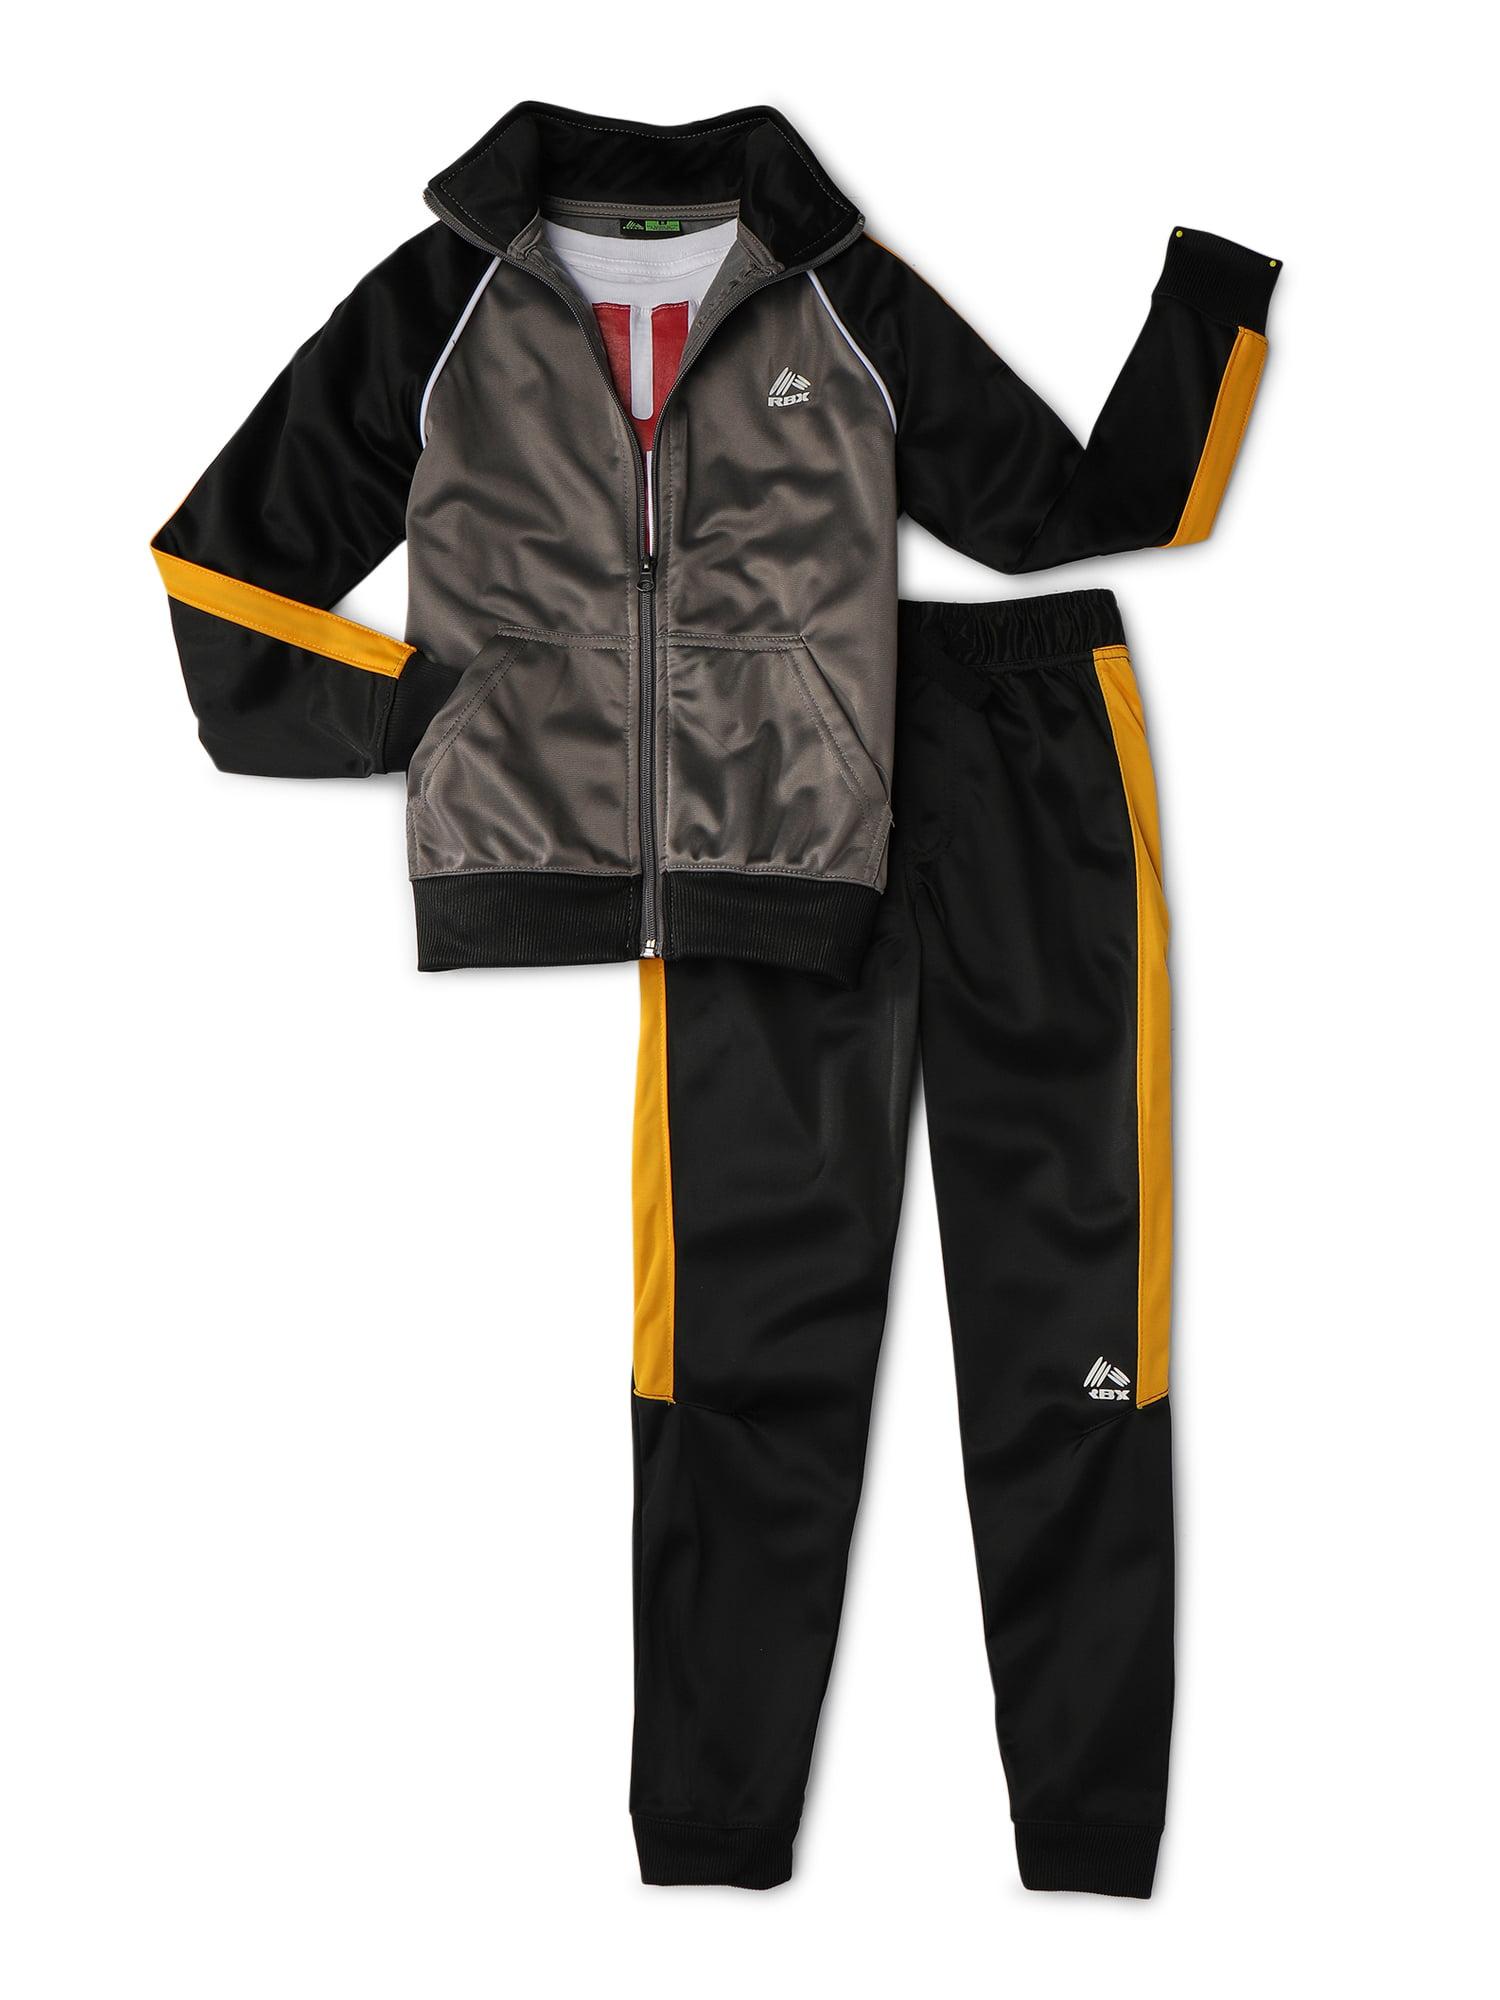 NB4237 A4 Youth Moisture Wicks Polyester Long Sleeve Winter Fleece Hoodie